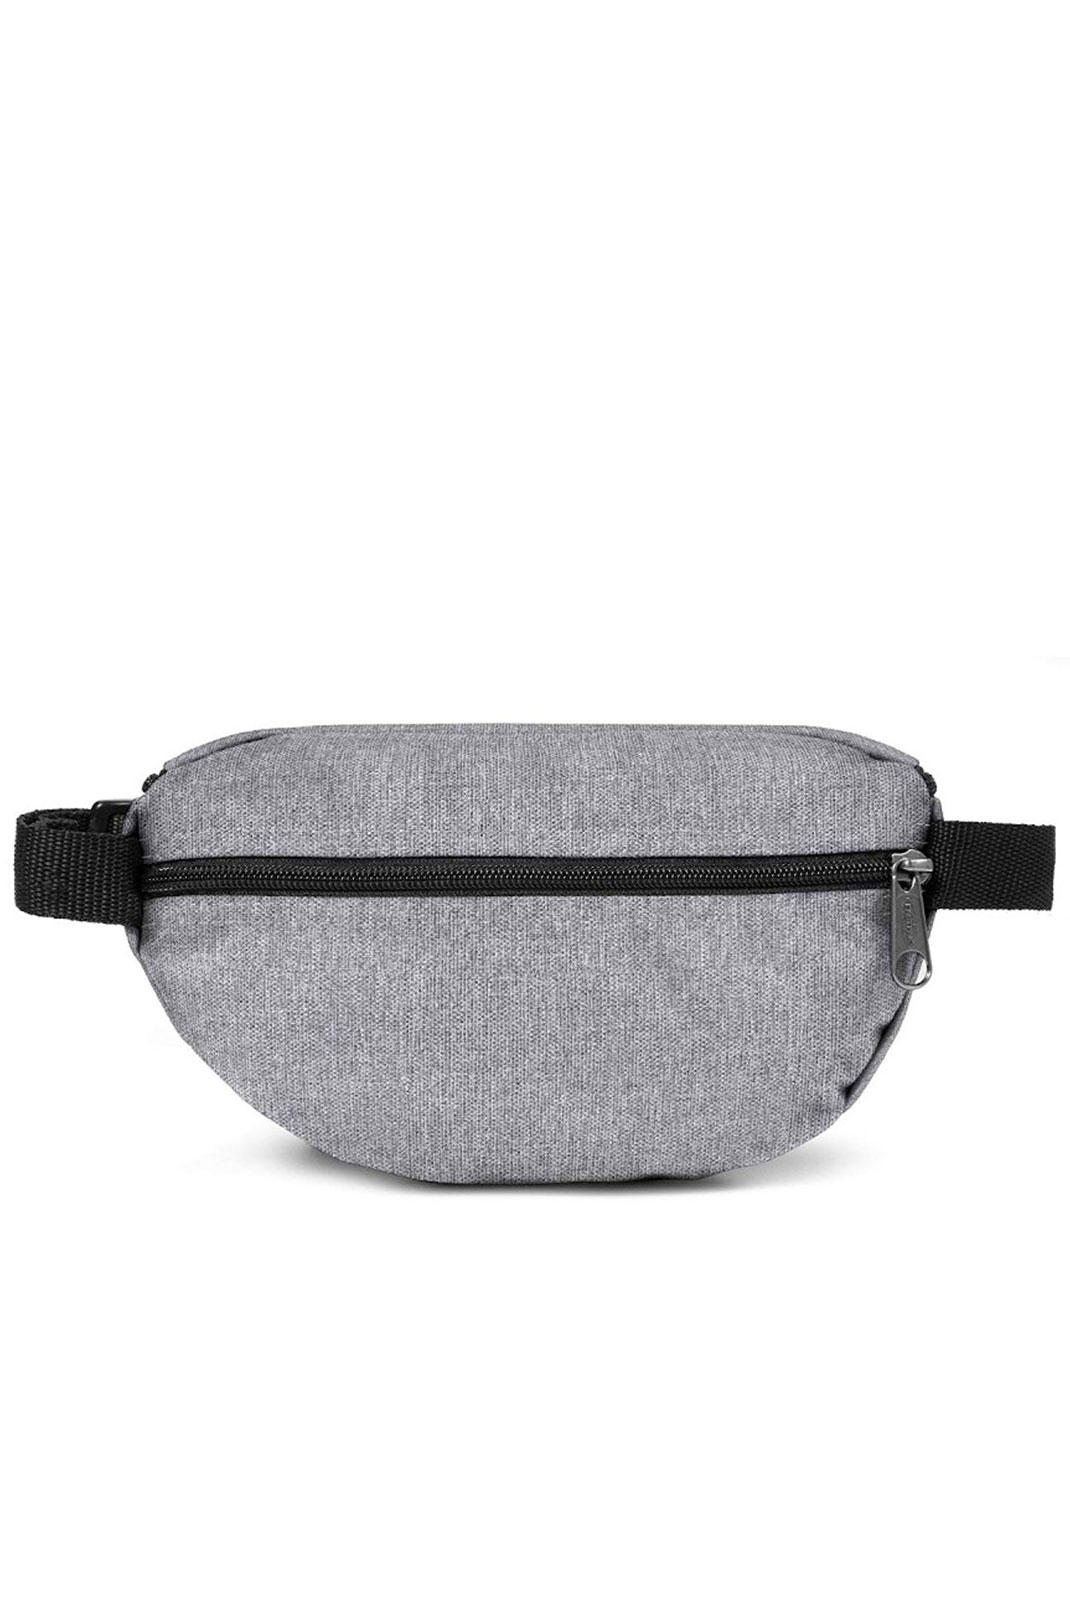 Sac porté épaule  Eastpak EK074363  gris